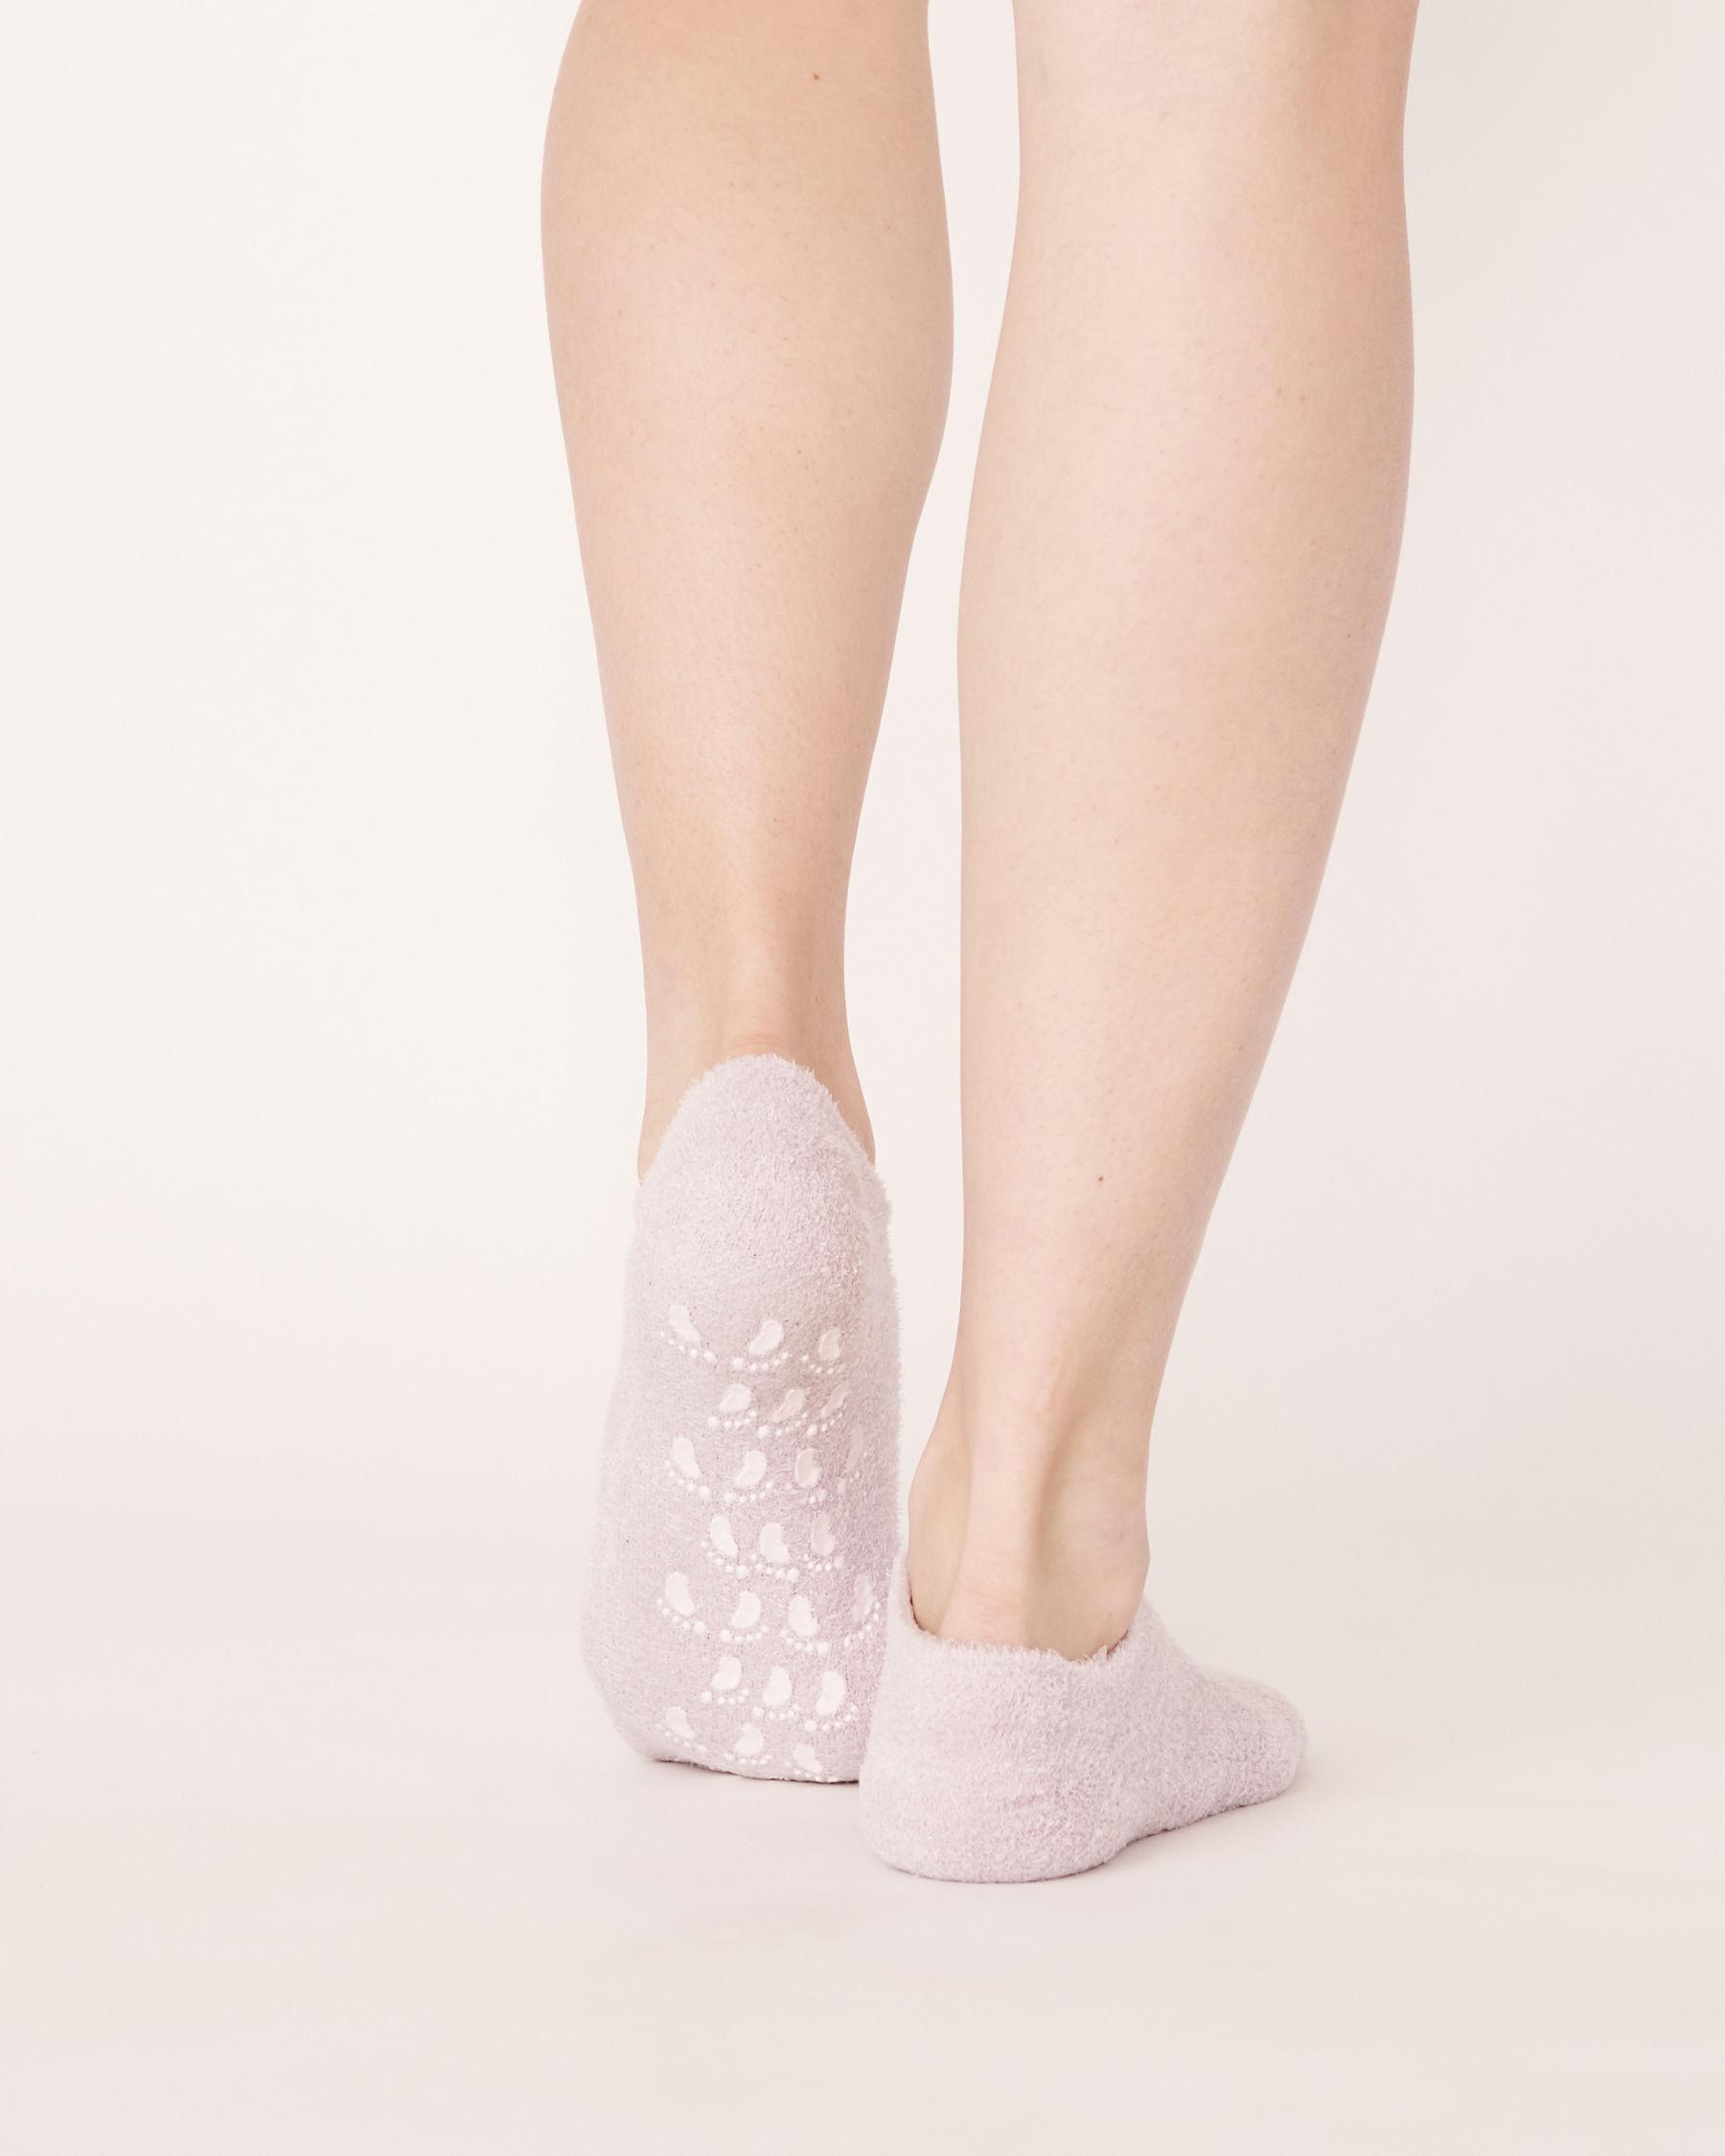 LA VIE EN ROSE Lavender Moisturizing Gel Socks Pale lilac 40700032 - View2